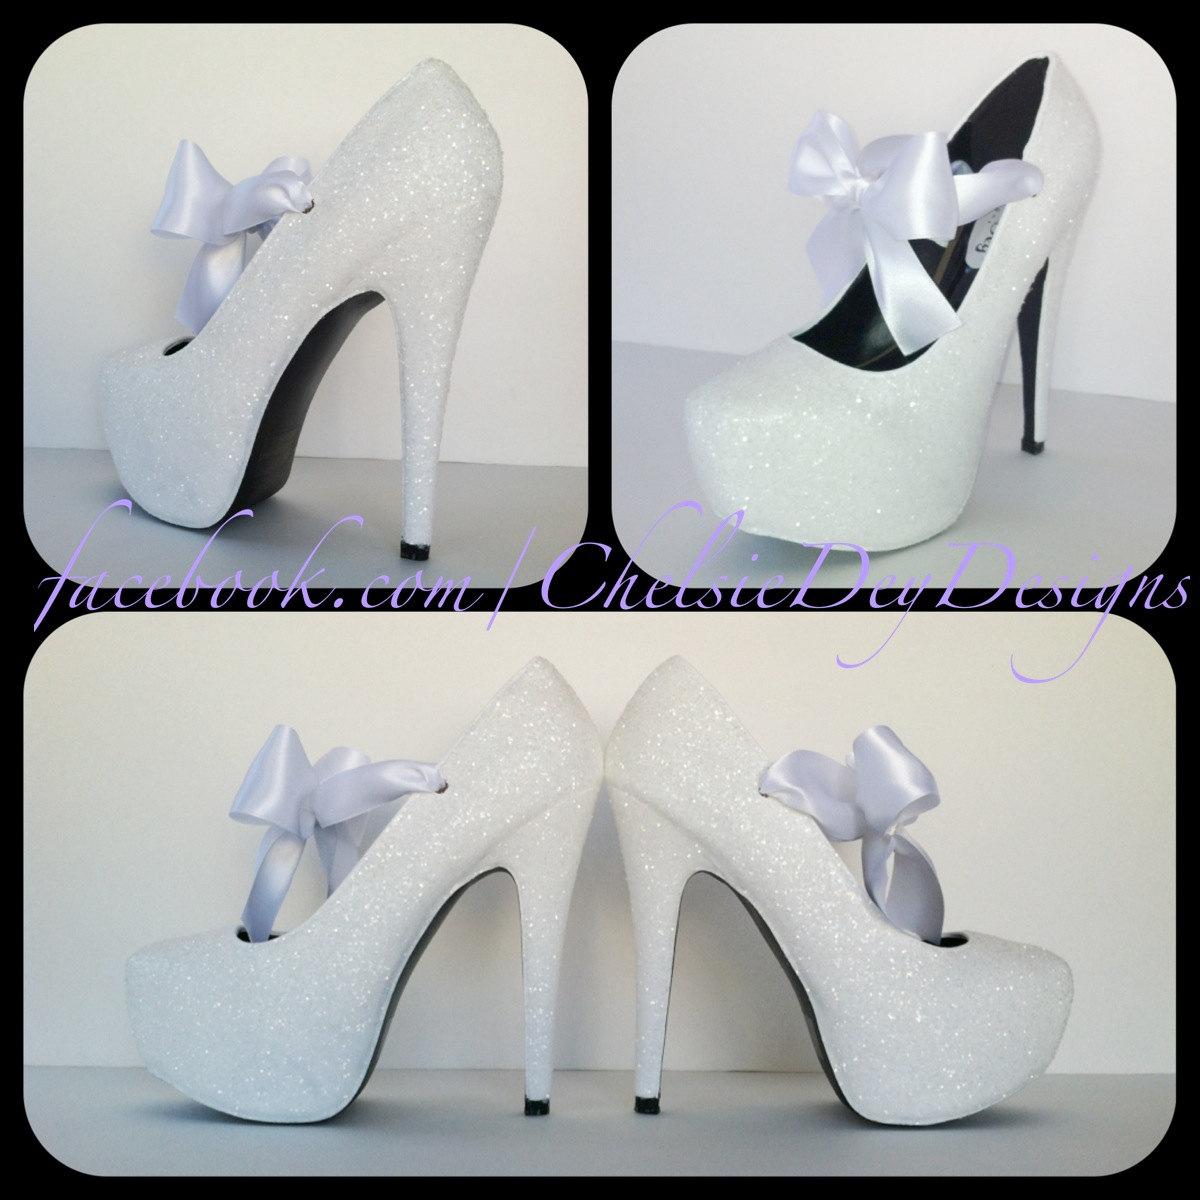 White Glitter High Heels, Wedding Platform Pumps, Sparkly Shoes with ...